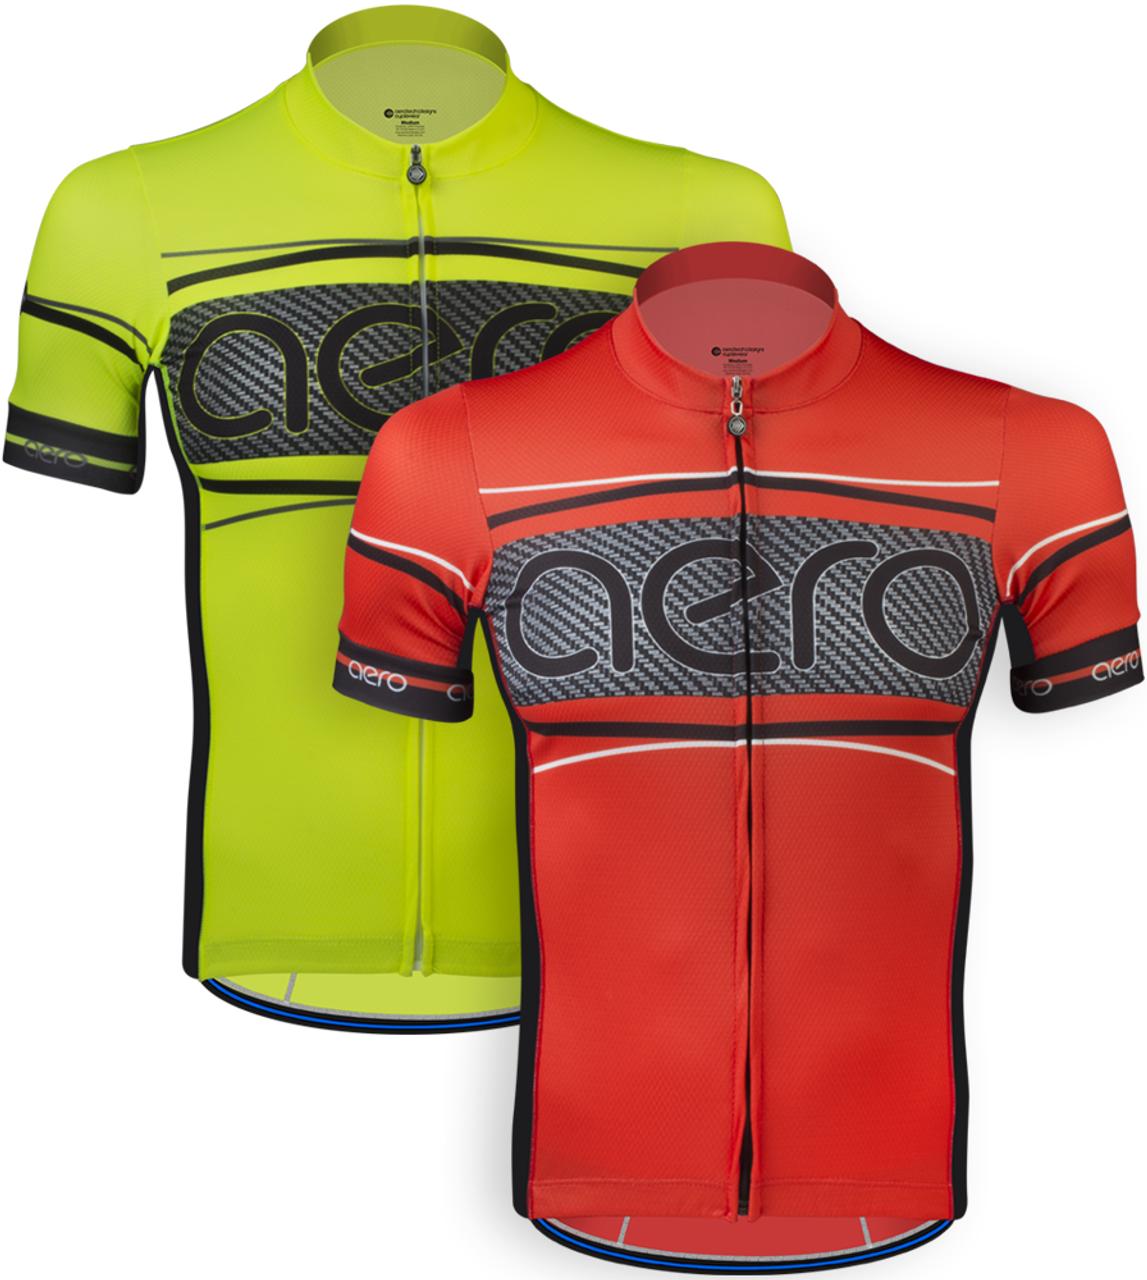 Aero Tech Designs Elite Recumbent Bike Jersey Cycling Top Made in USA